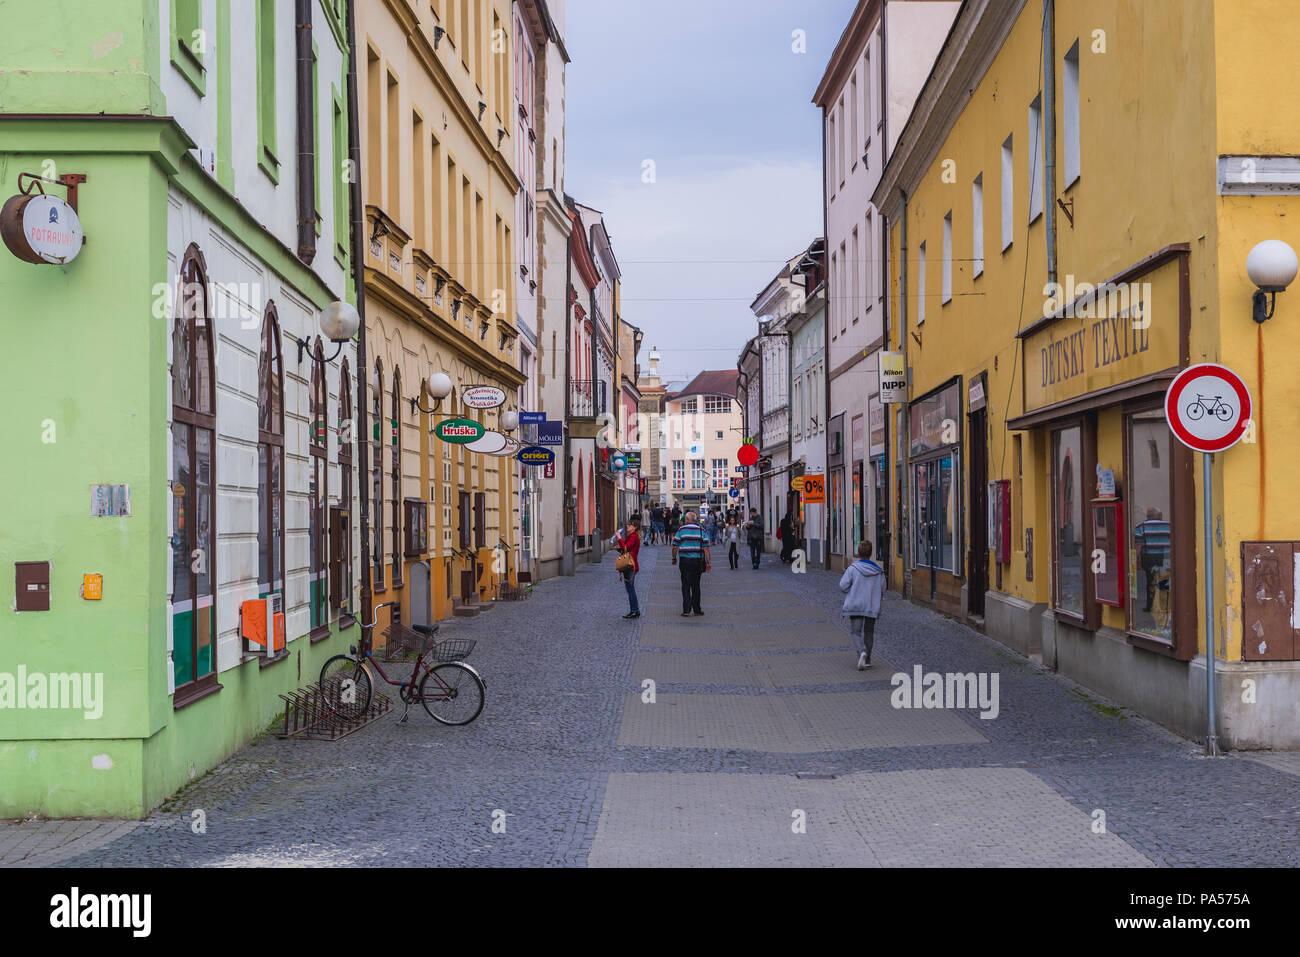 Old Town of Uherske Hradiste city in Zlin Region, Moravia in Czech Republic - Stock Image